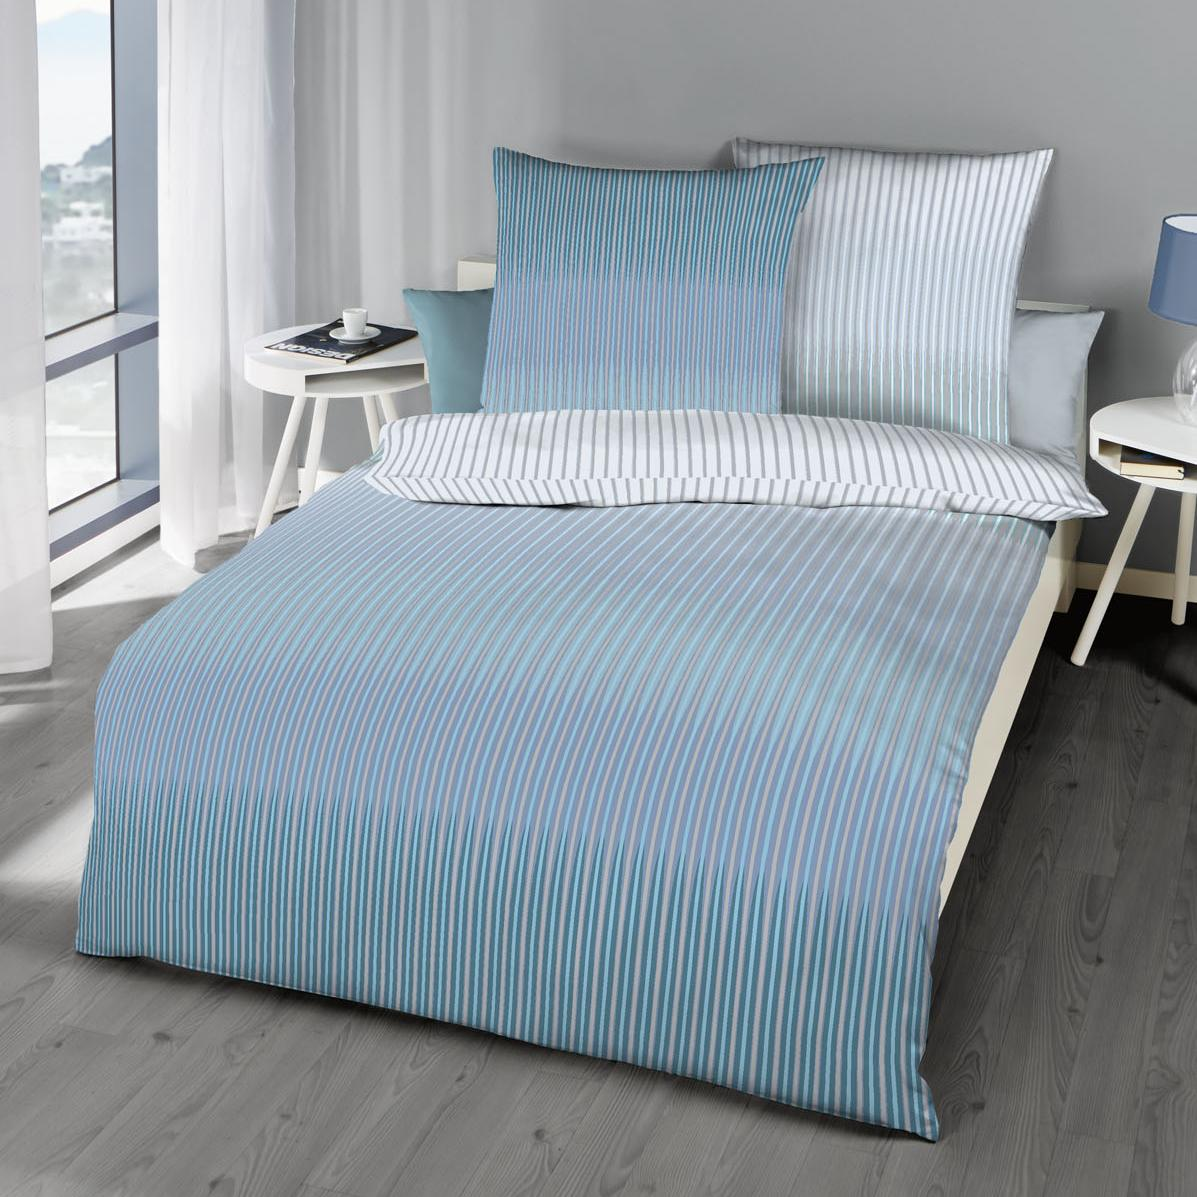 posteljnina kaeppel skala modra